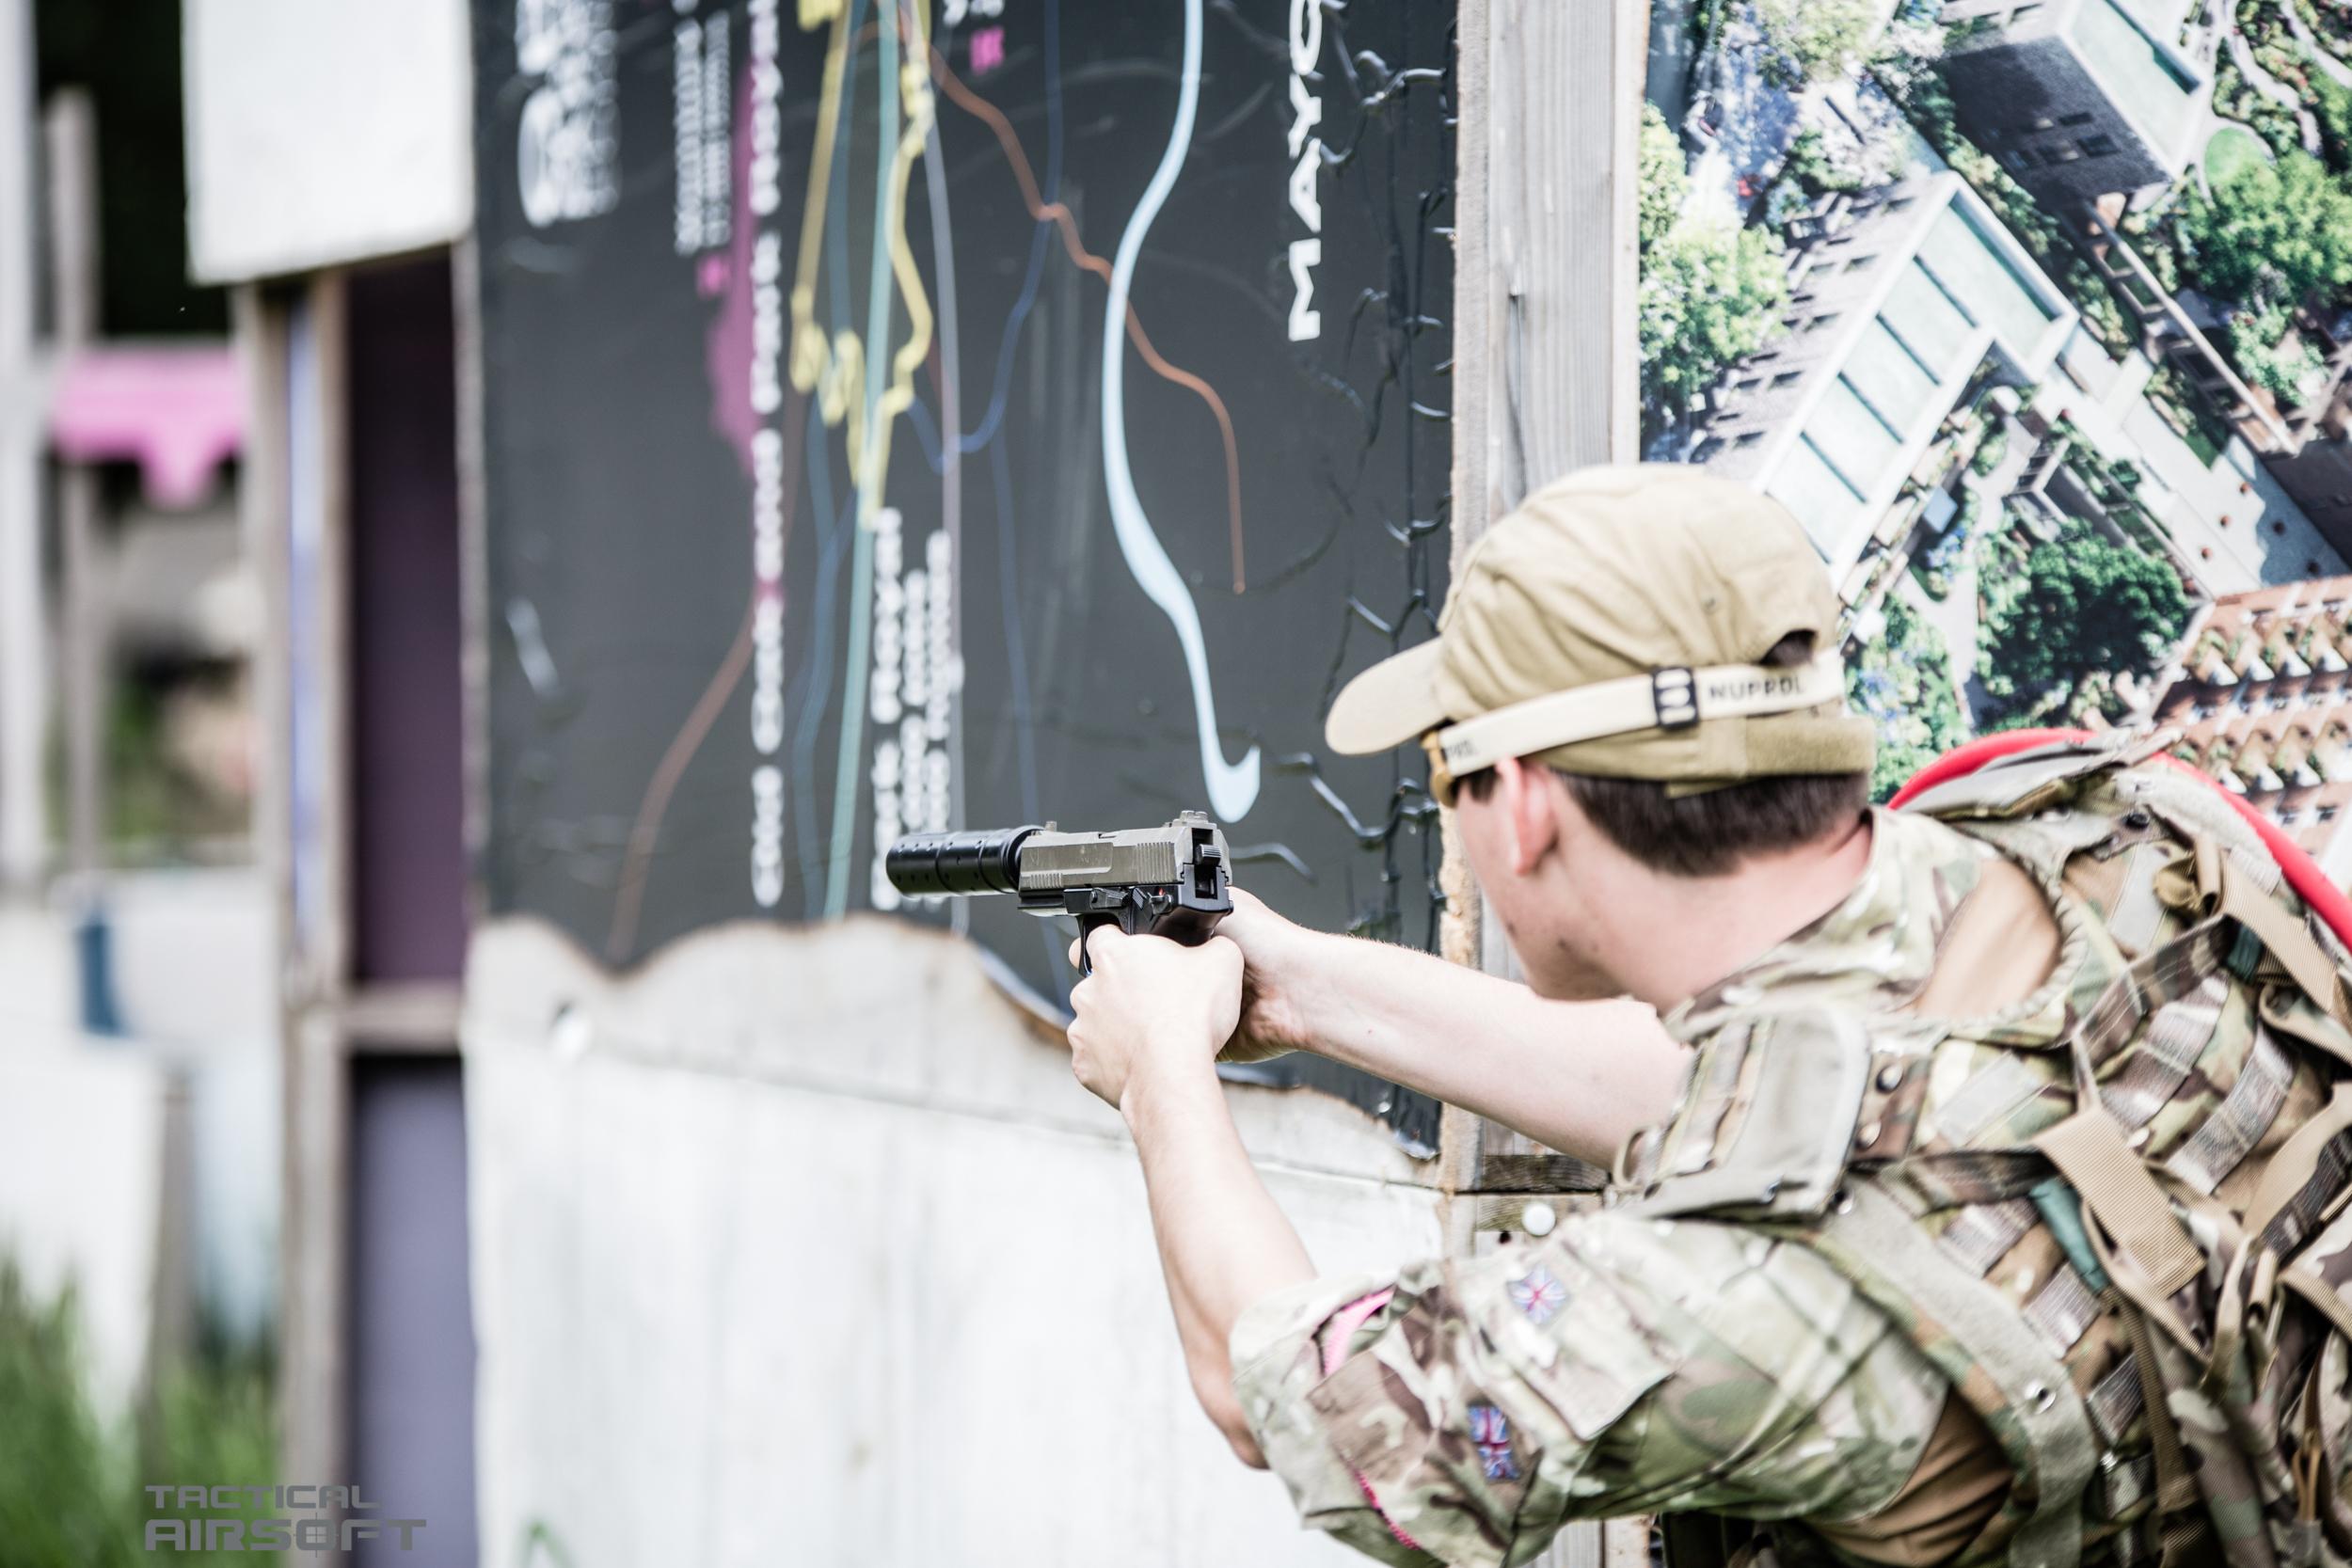 Tactical Warfare Airsoft - Croydon, Surrey CR6 9PH - 020 3490 8008 | ShowMeLocal.com